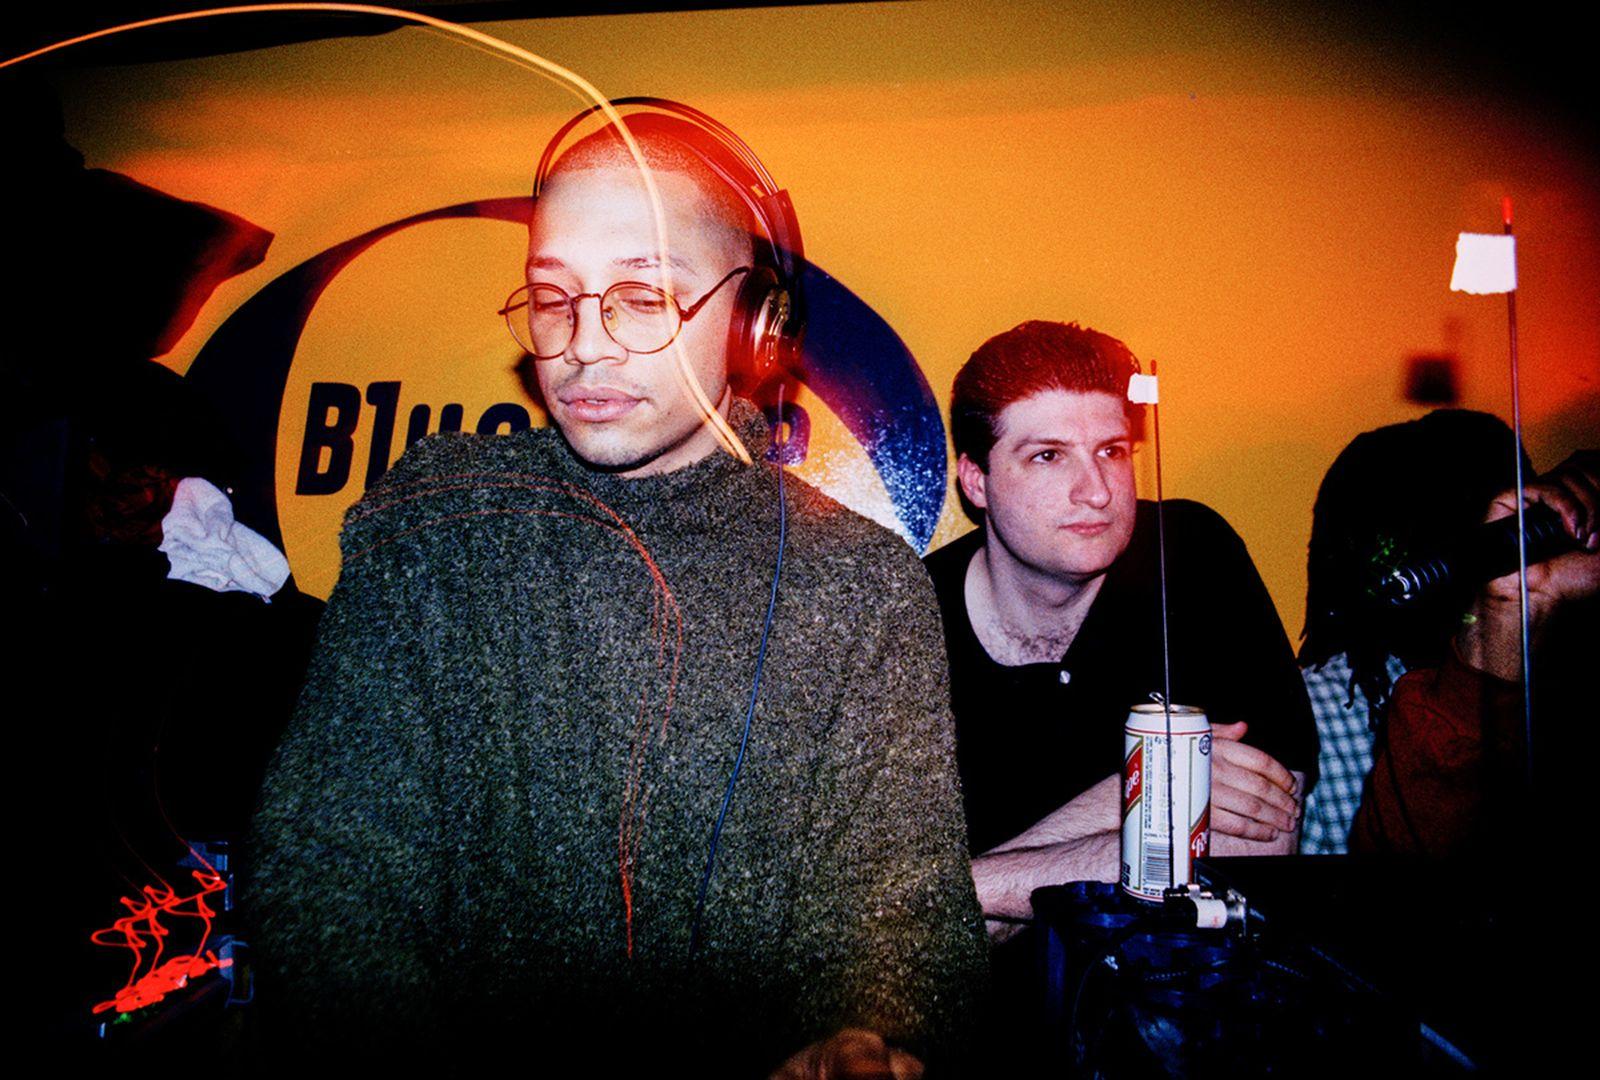 LTJ Bukem and Peshay at Metalheadz Sunday Sessions, 1996